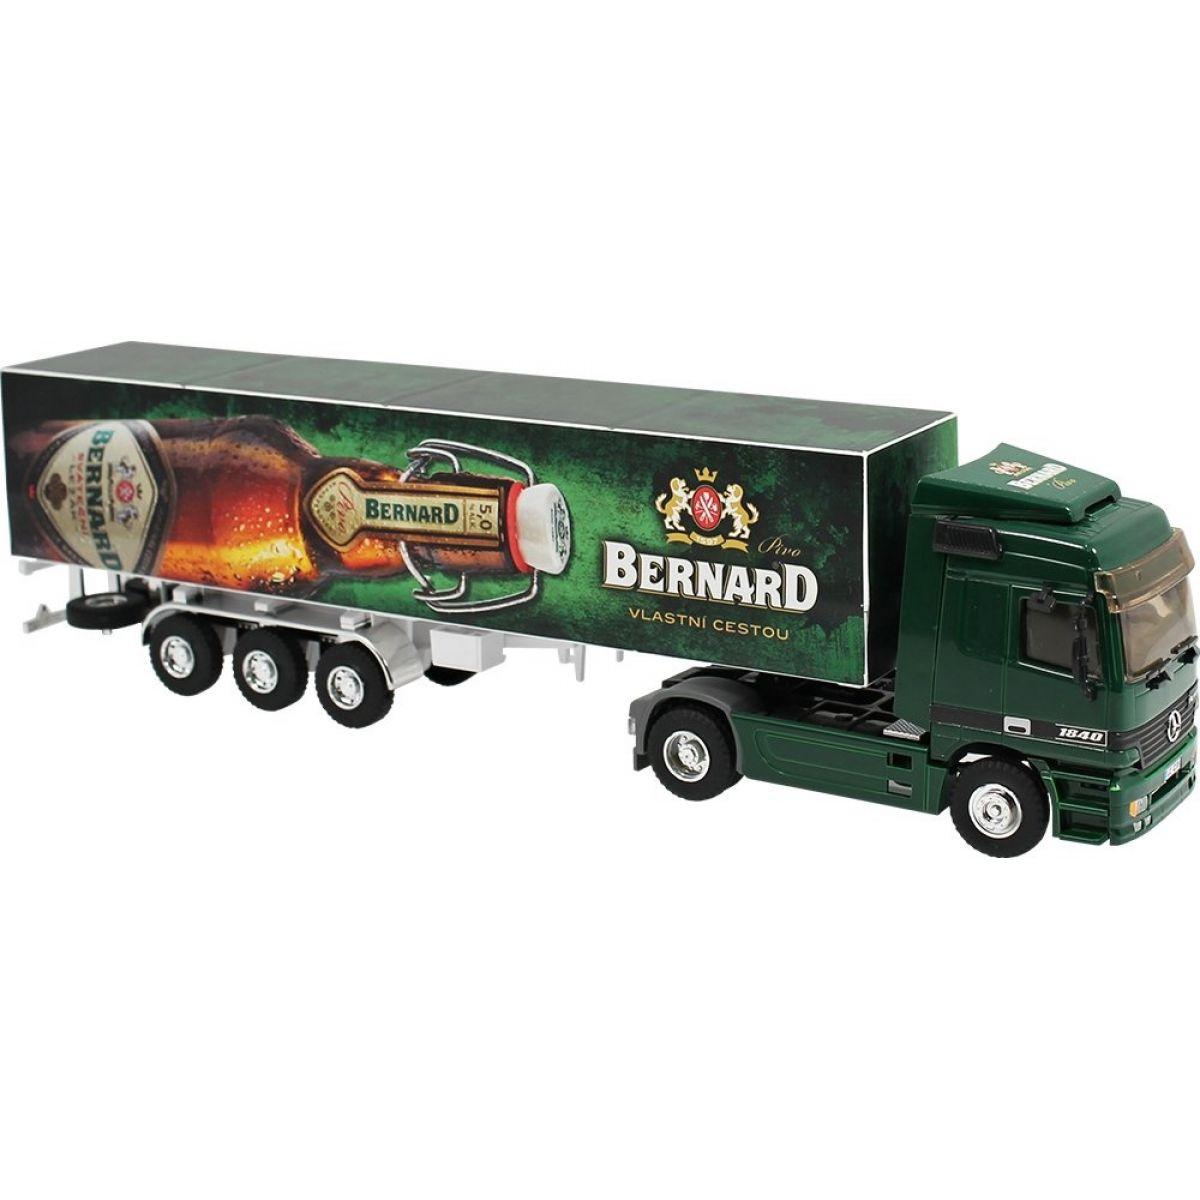 Monti System 61.10 Kamion Bernard